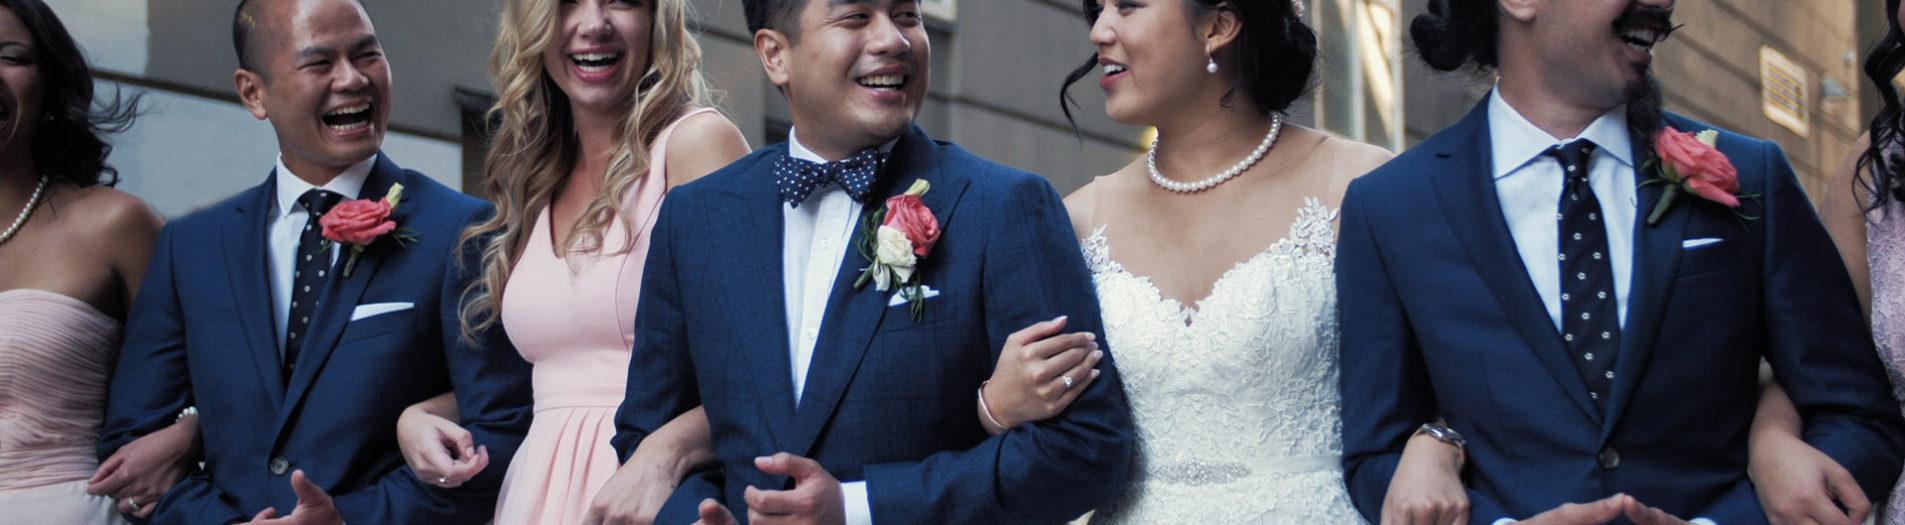 Vancouver + Edmonton Wedding Videographer | Chris and Catherine